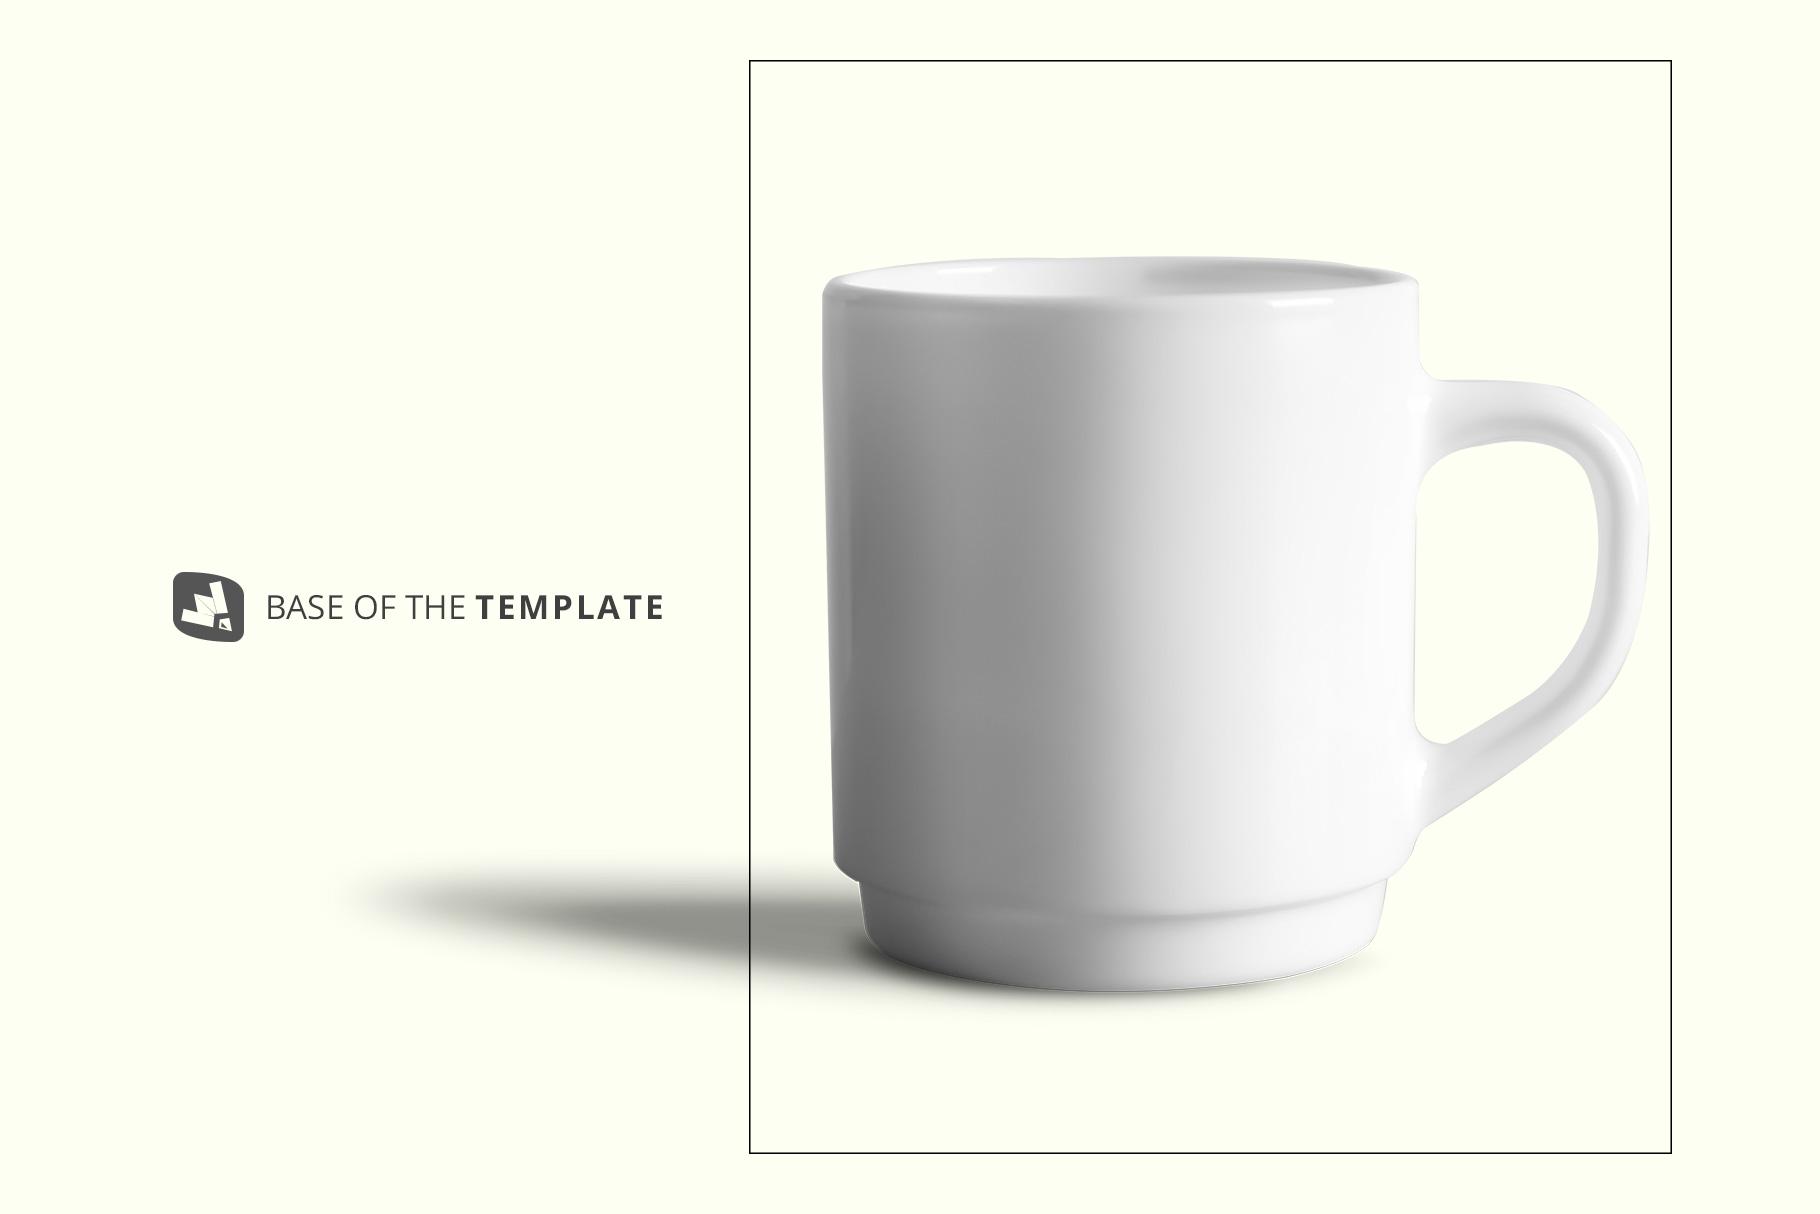 base image of the porcelain coffee cups set mockup